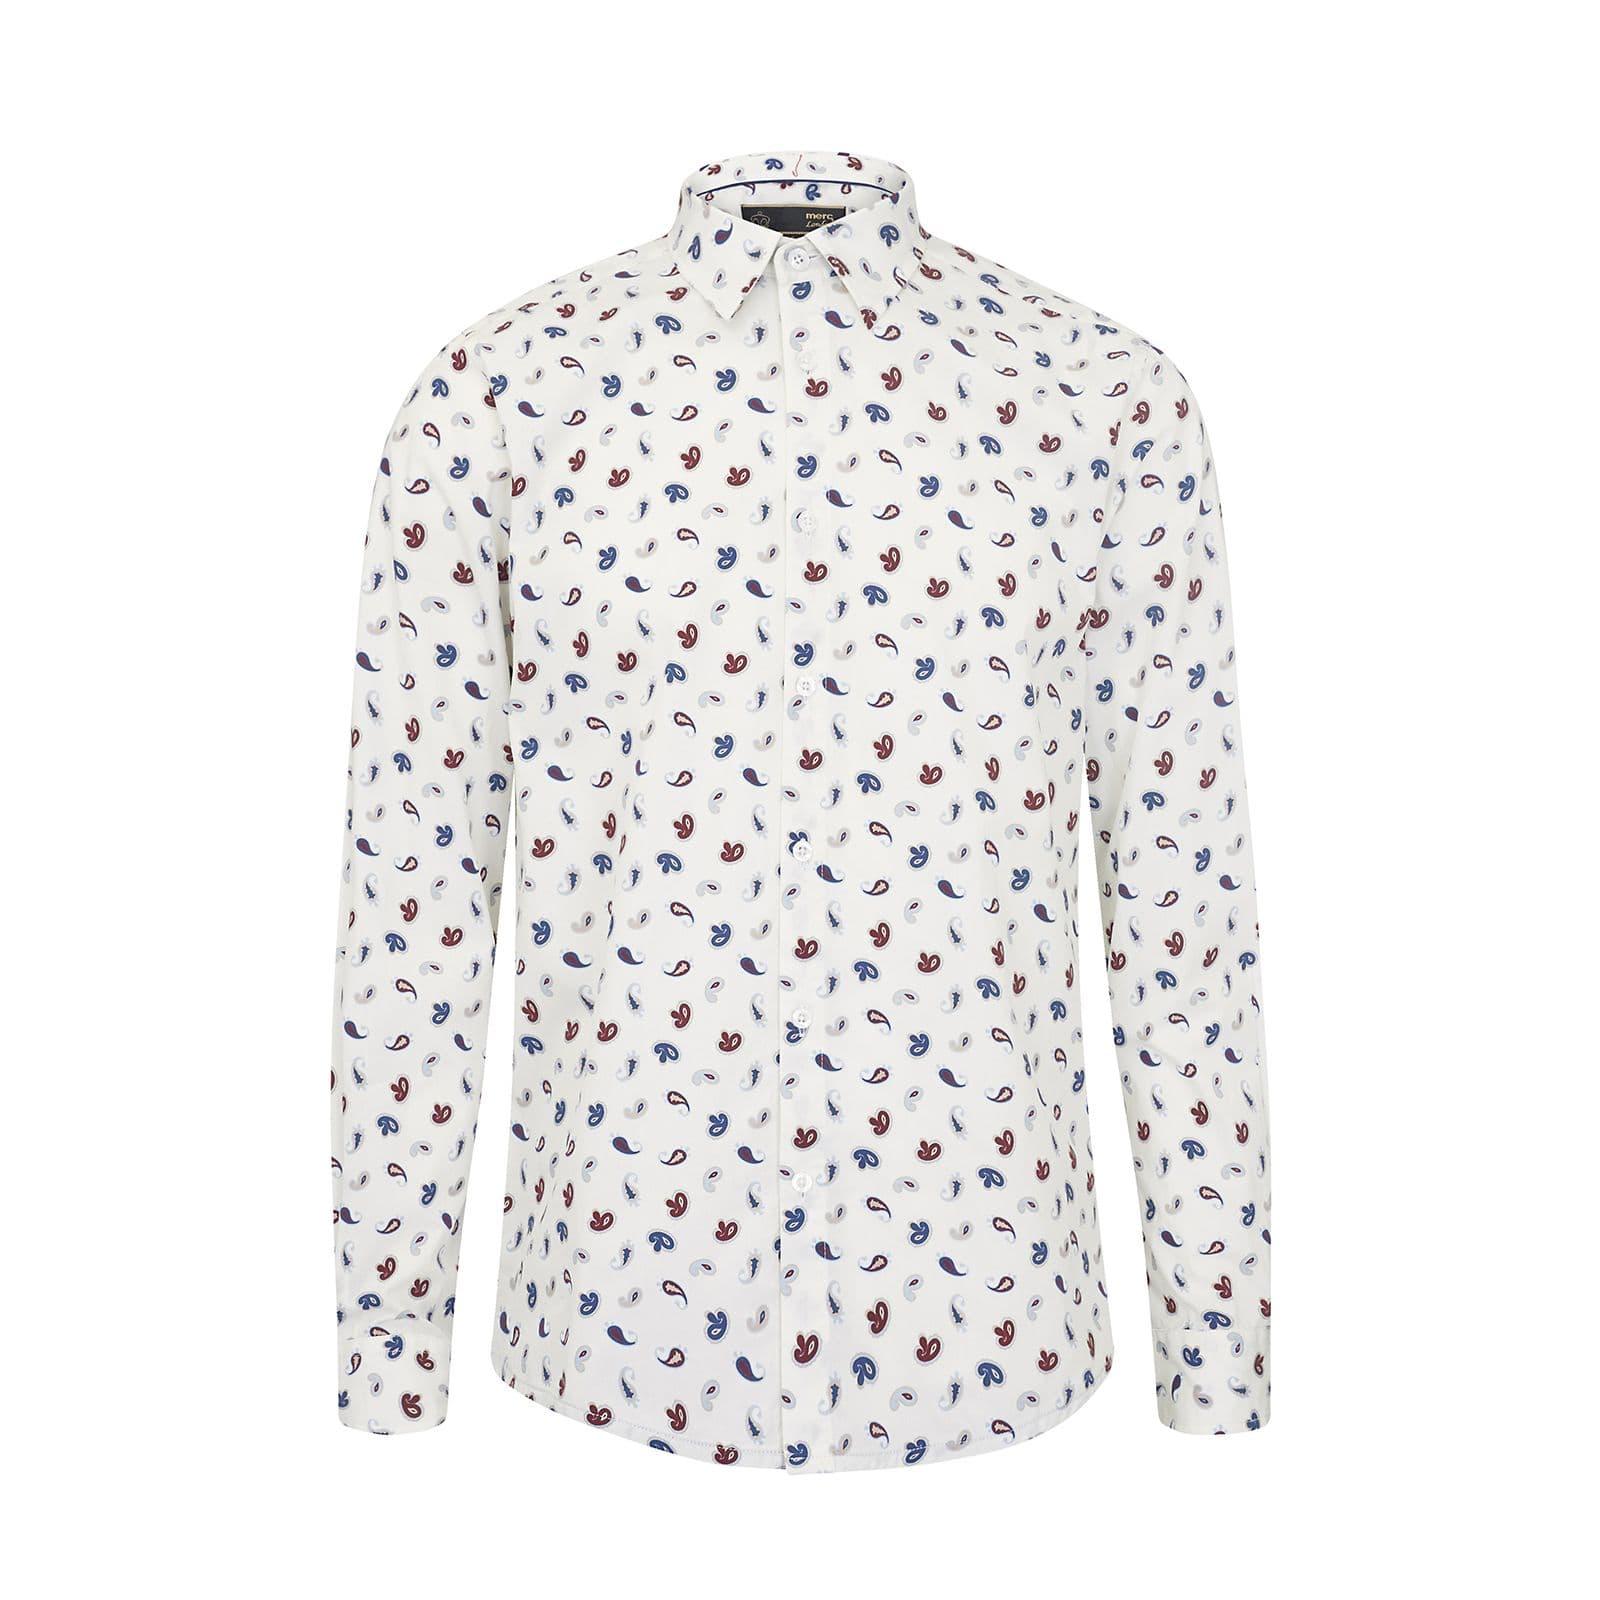 Рубашка AlanРубашки под заказ<br><br><br>Артикул: 1517201<br>Материал: 100% хлопок<br>Цвет: белый<br>Пол: Мужской